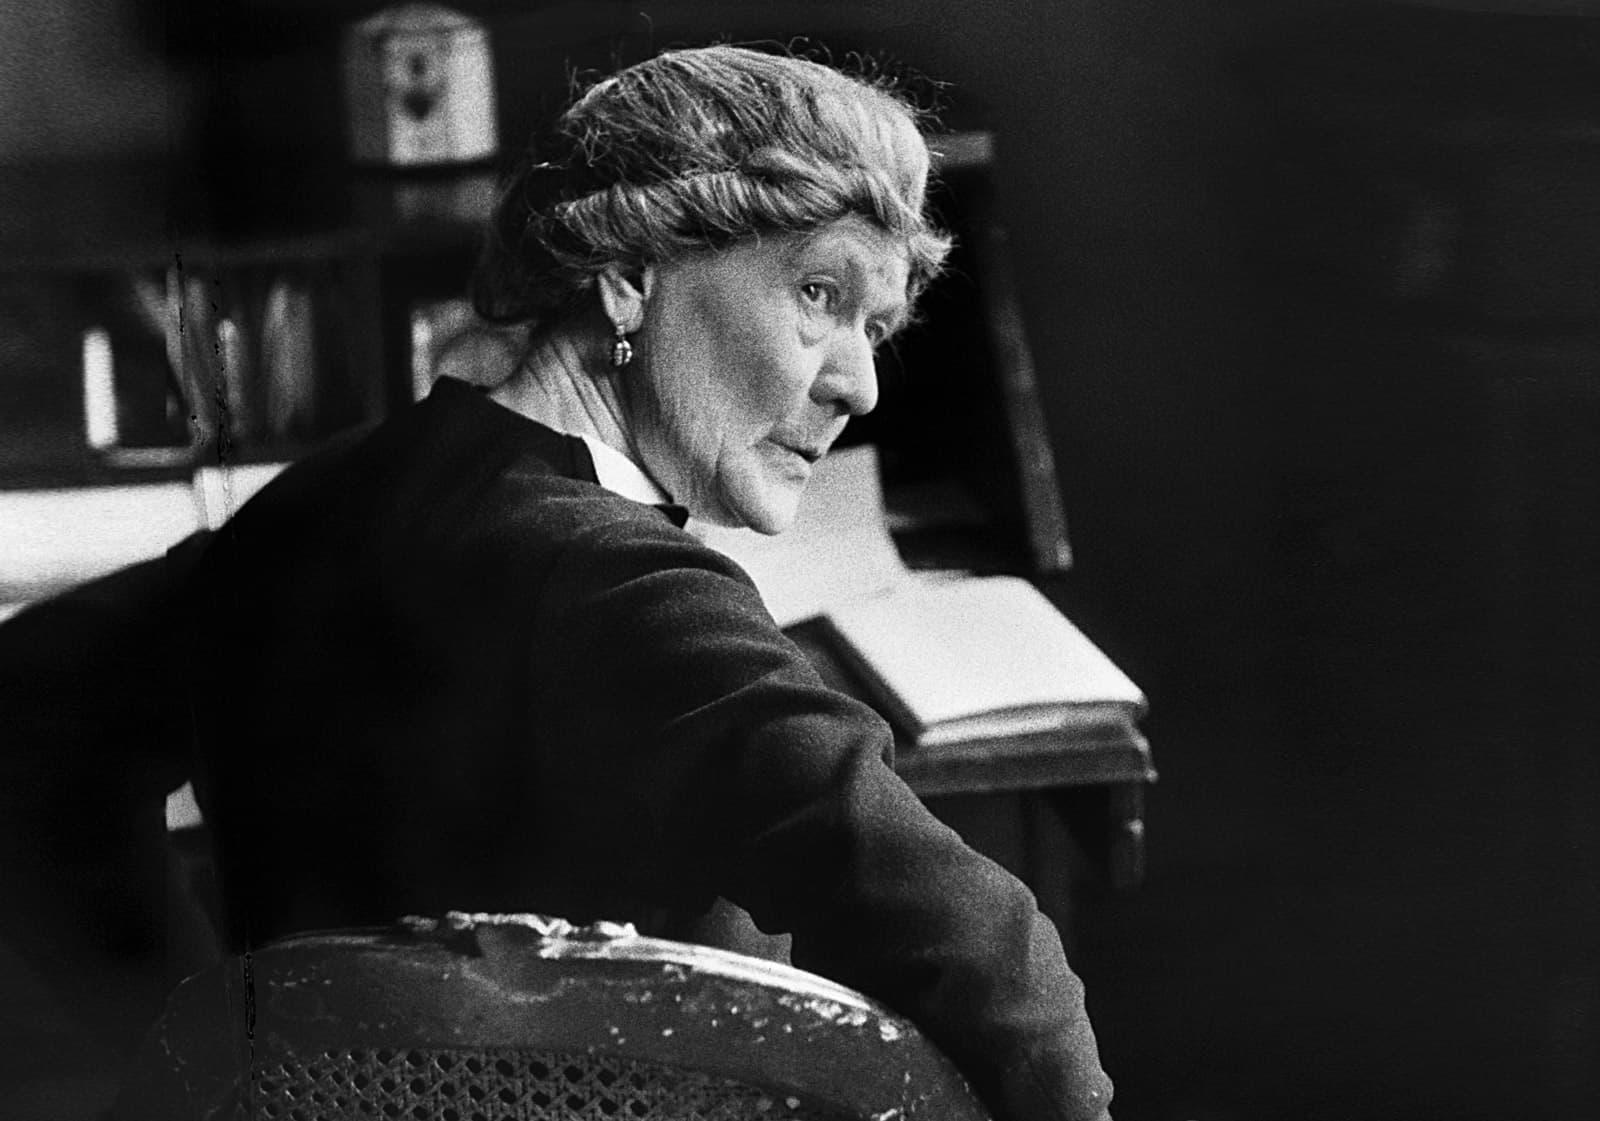 La novel·lista Ivy Compton-Burnett (1892-1969) en una imatge de 1967. Fotografia de Hulton-Deutsch Collection/CORBIS/Corbis via Getty Images.